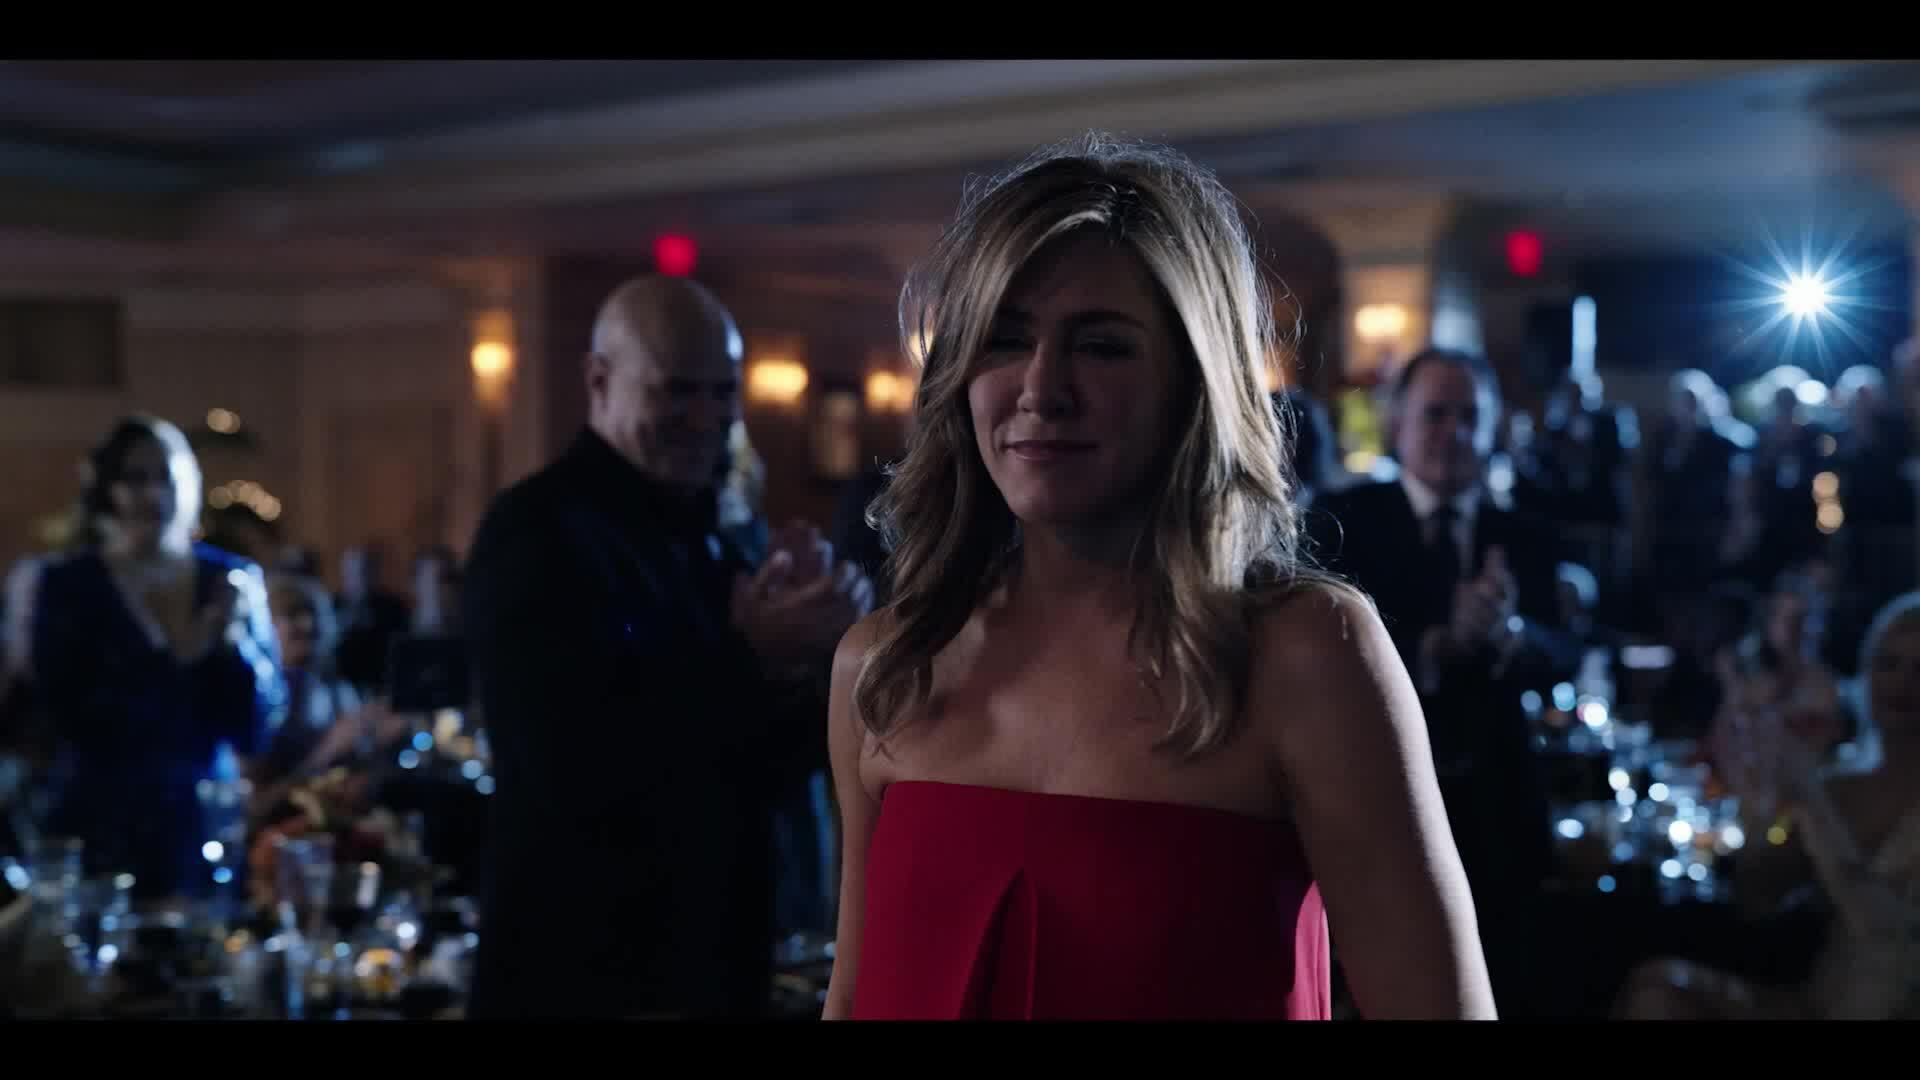 Jennifer Aniston - The Morning Show trailer